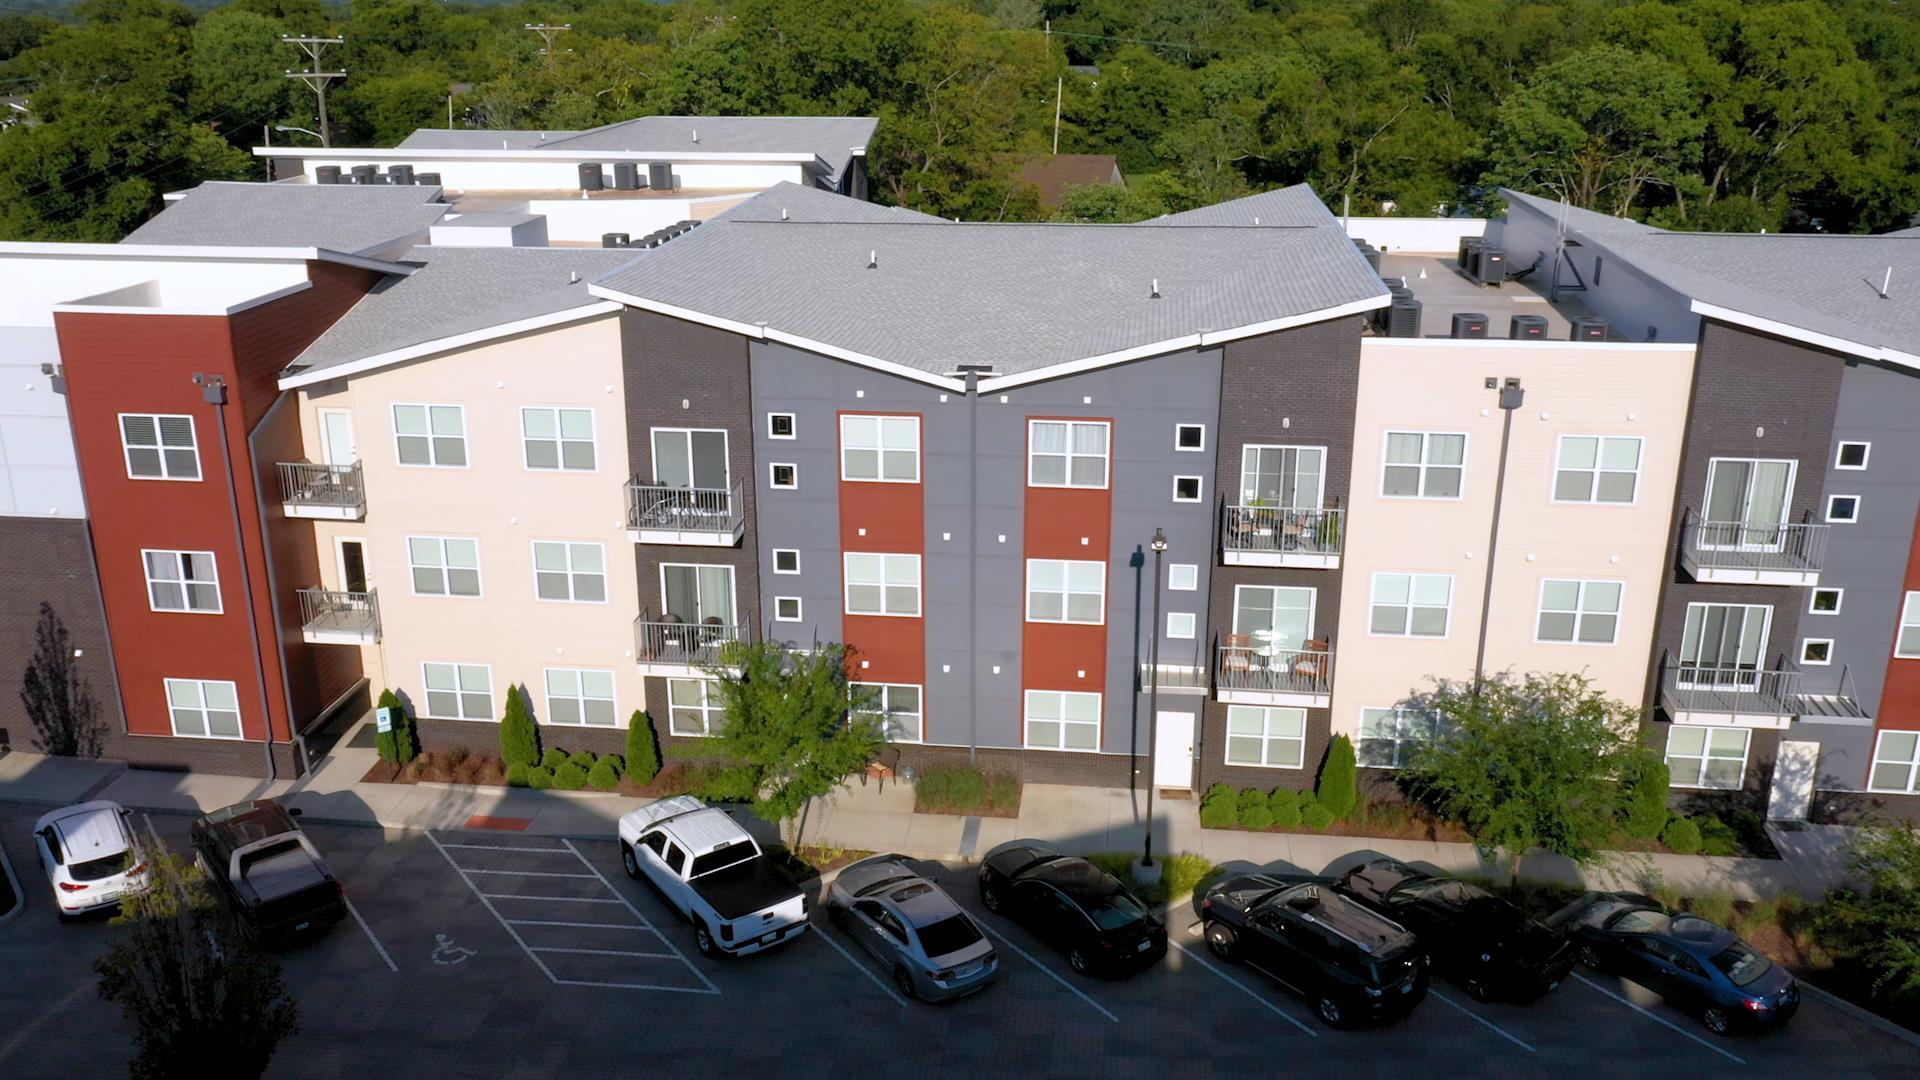 1122 Litton Ave Apt 315, Nashville, TN 37216 - Nashville, TN real estate listing